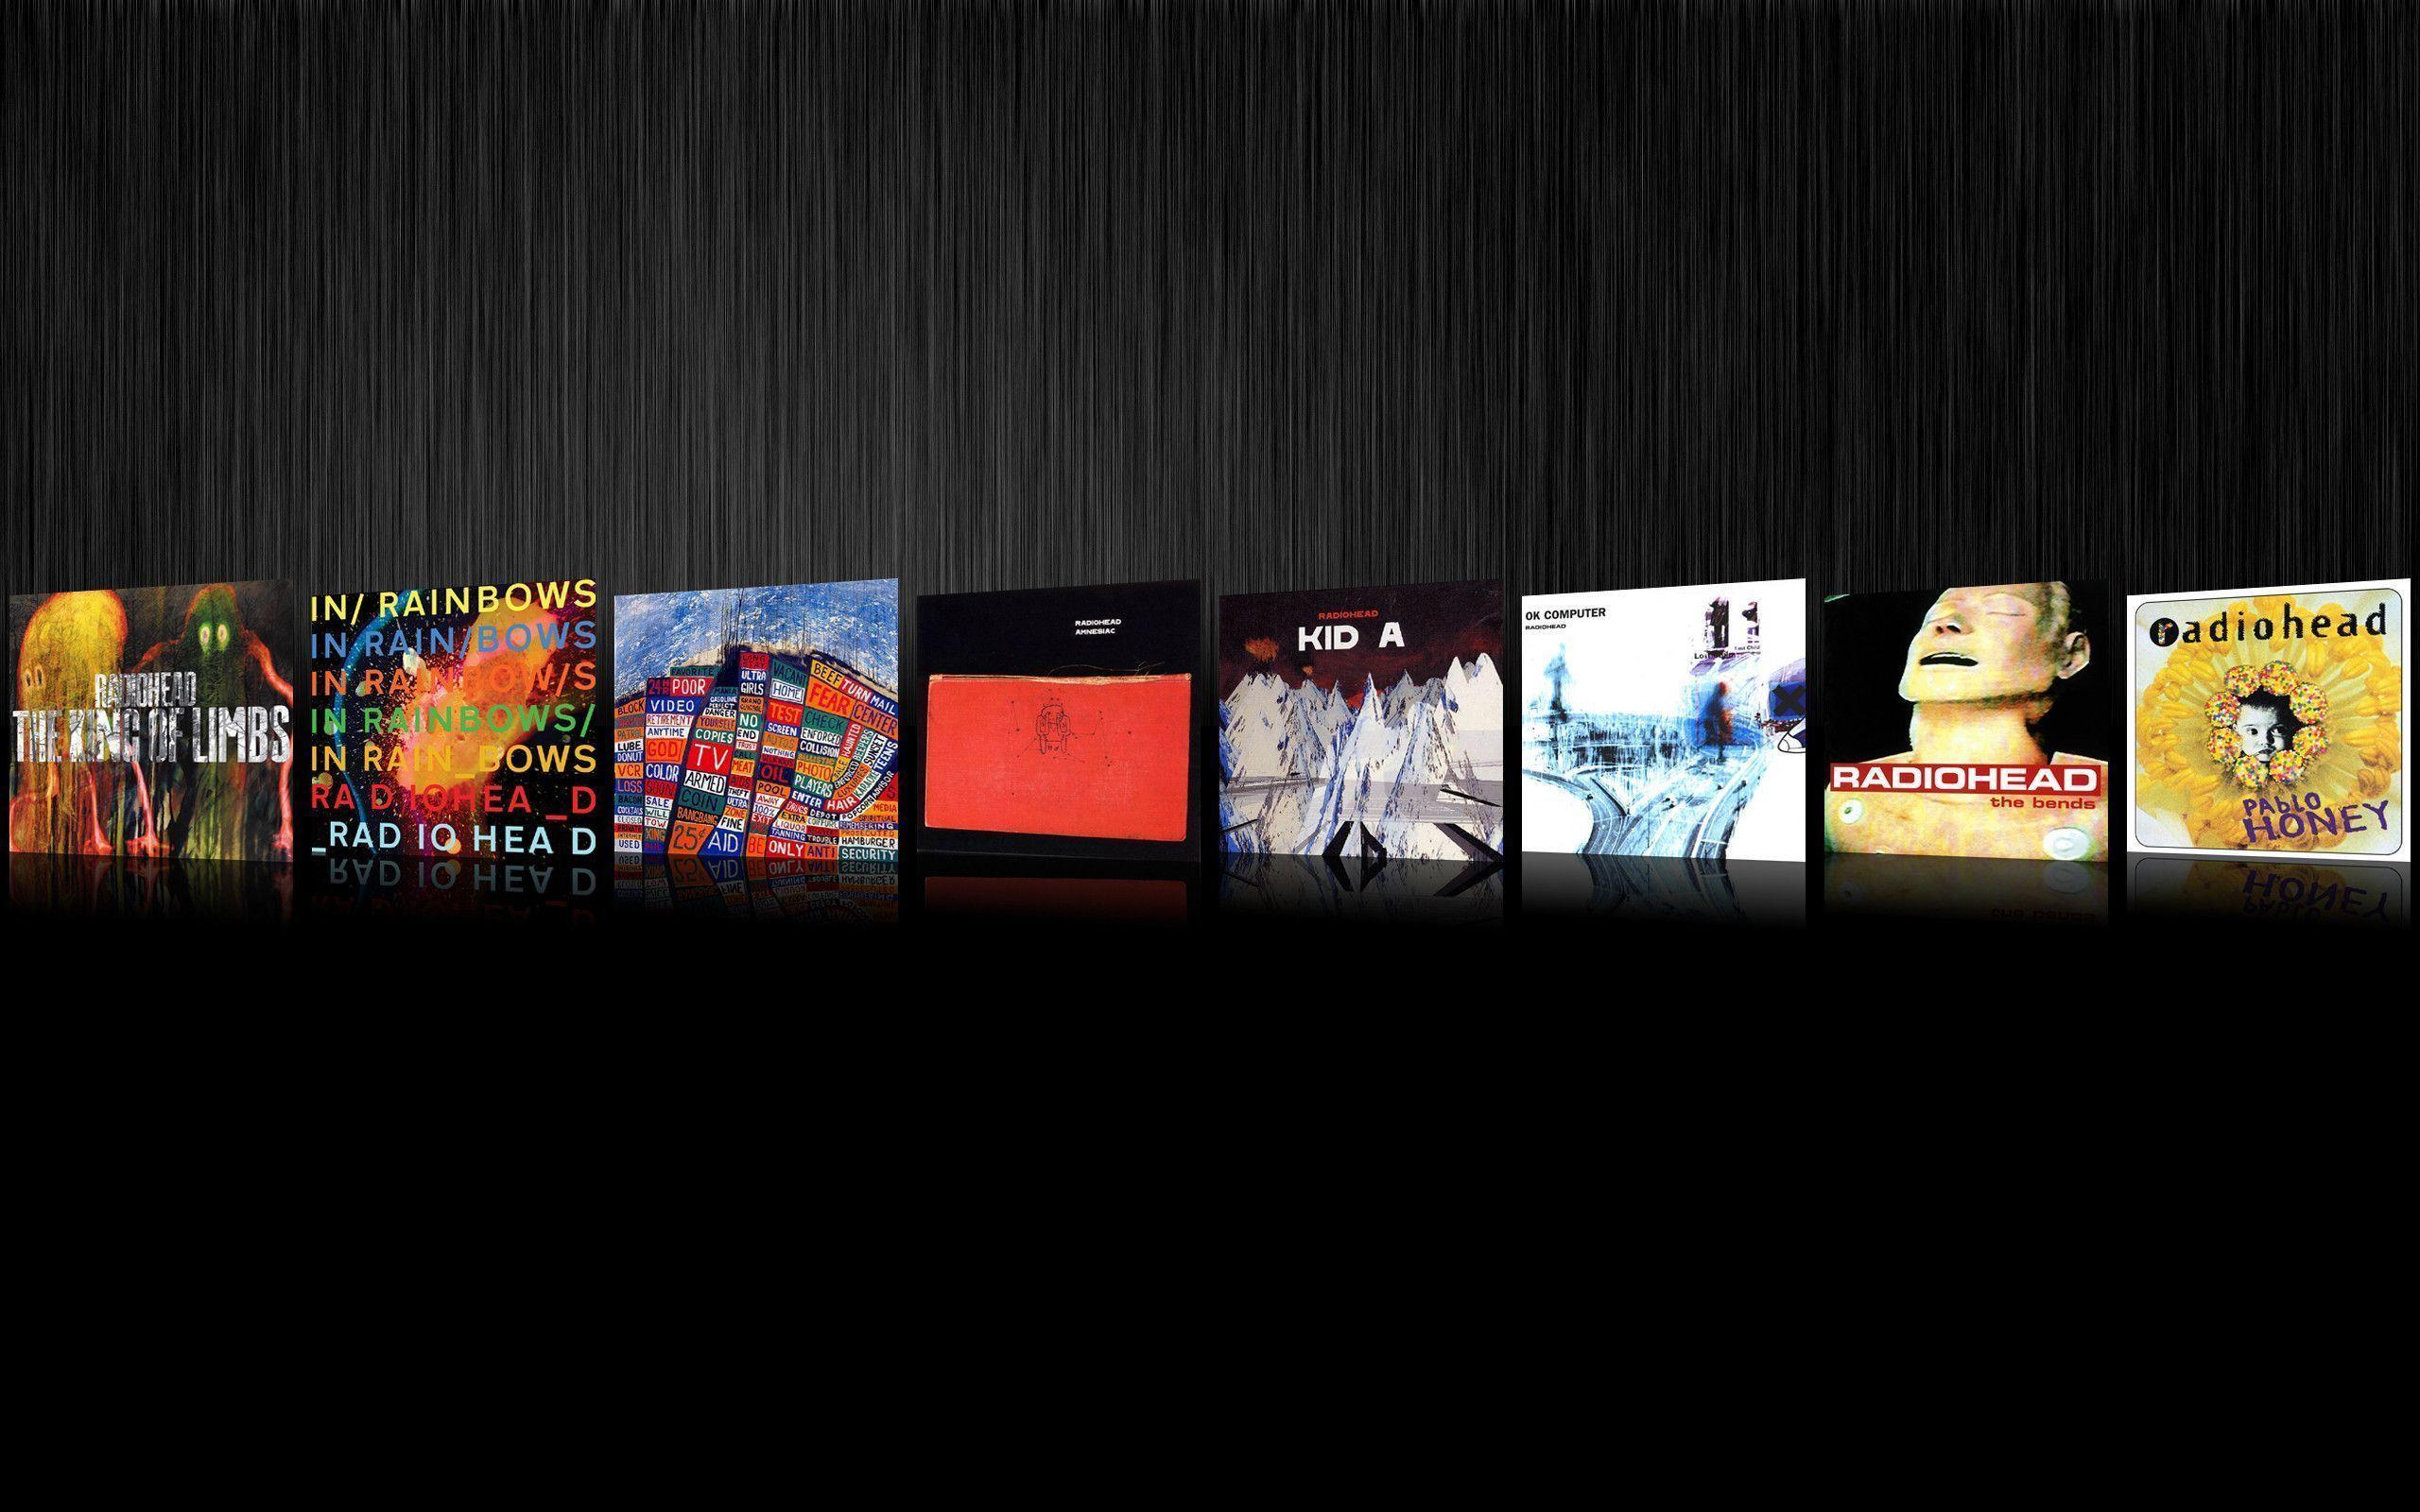 Radiohead Wallpapers Top Free Radiohead Backgrounds Wallpaperaccess